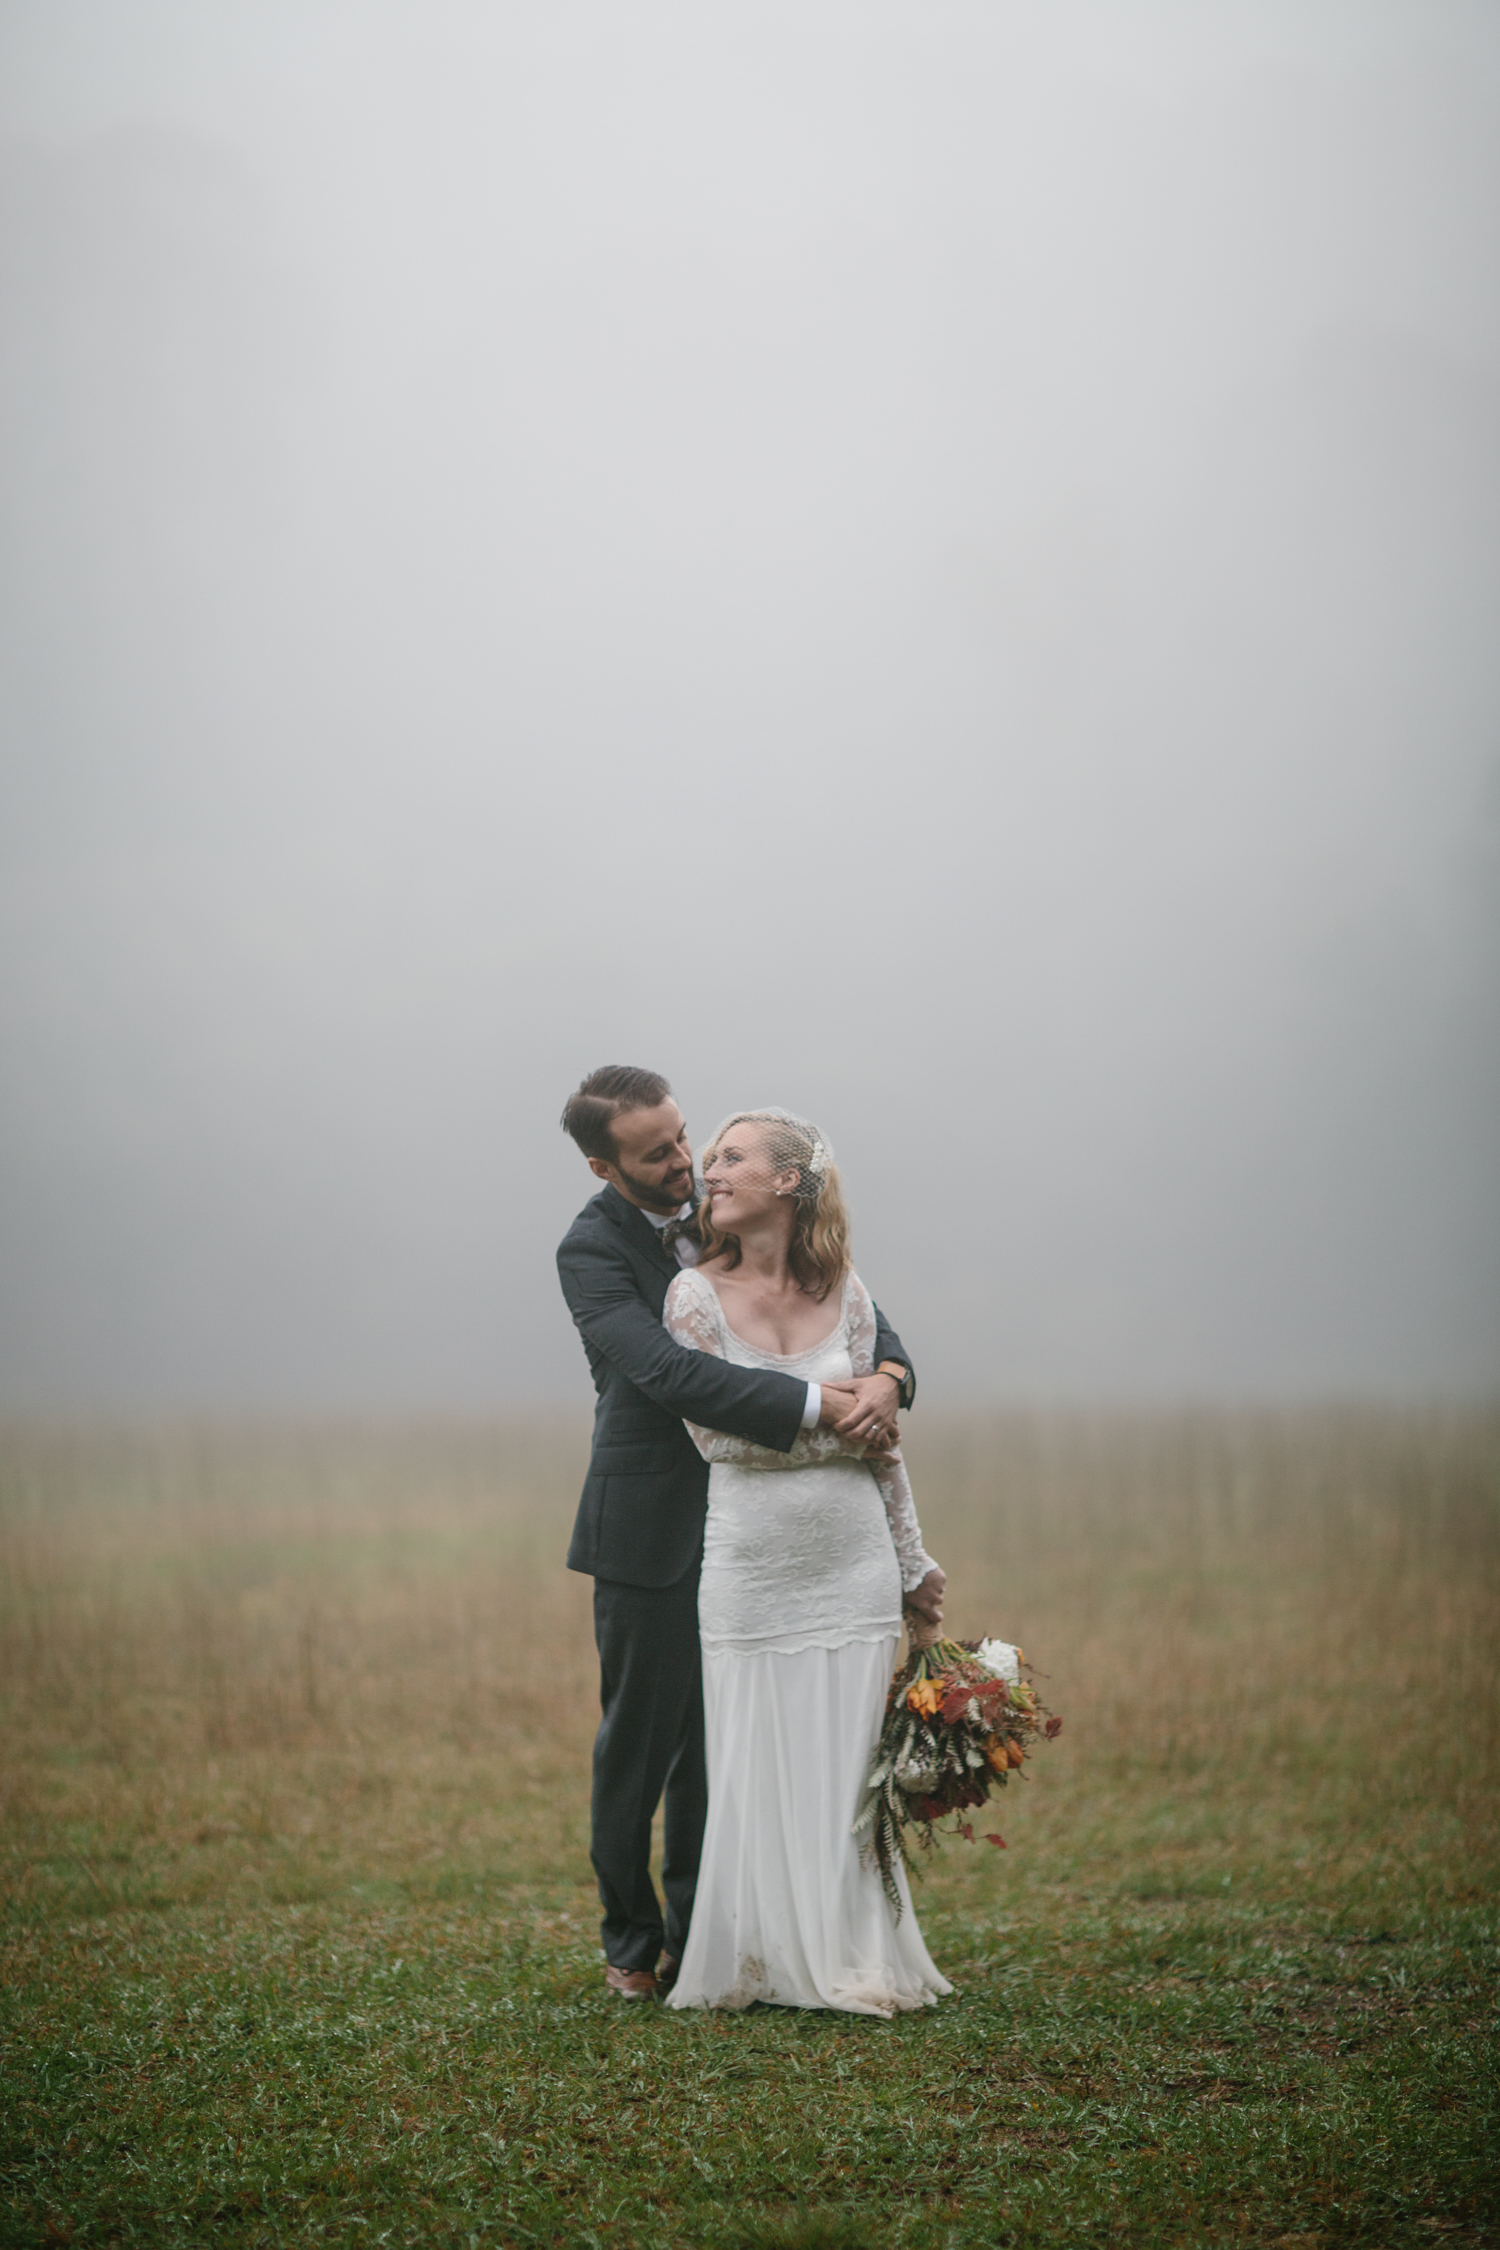 Lindsay-Nick-bilpin-pine-forrest-nsw-wedding-150